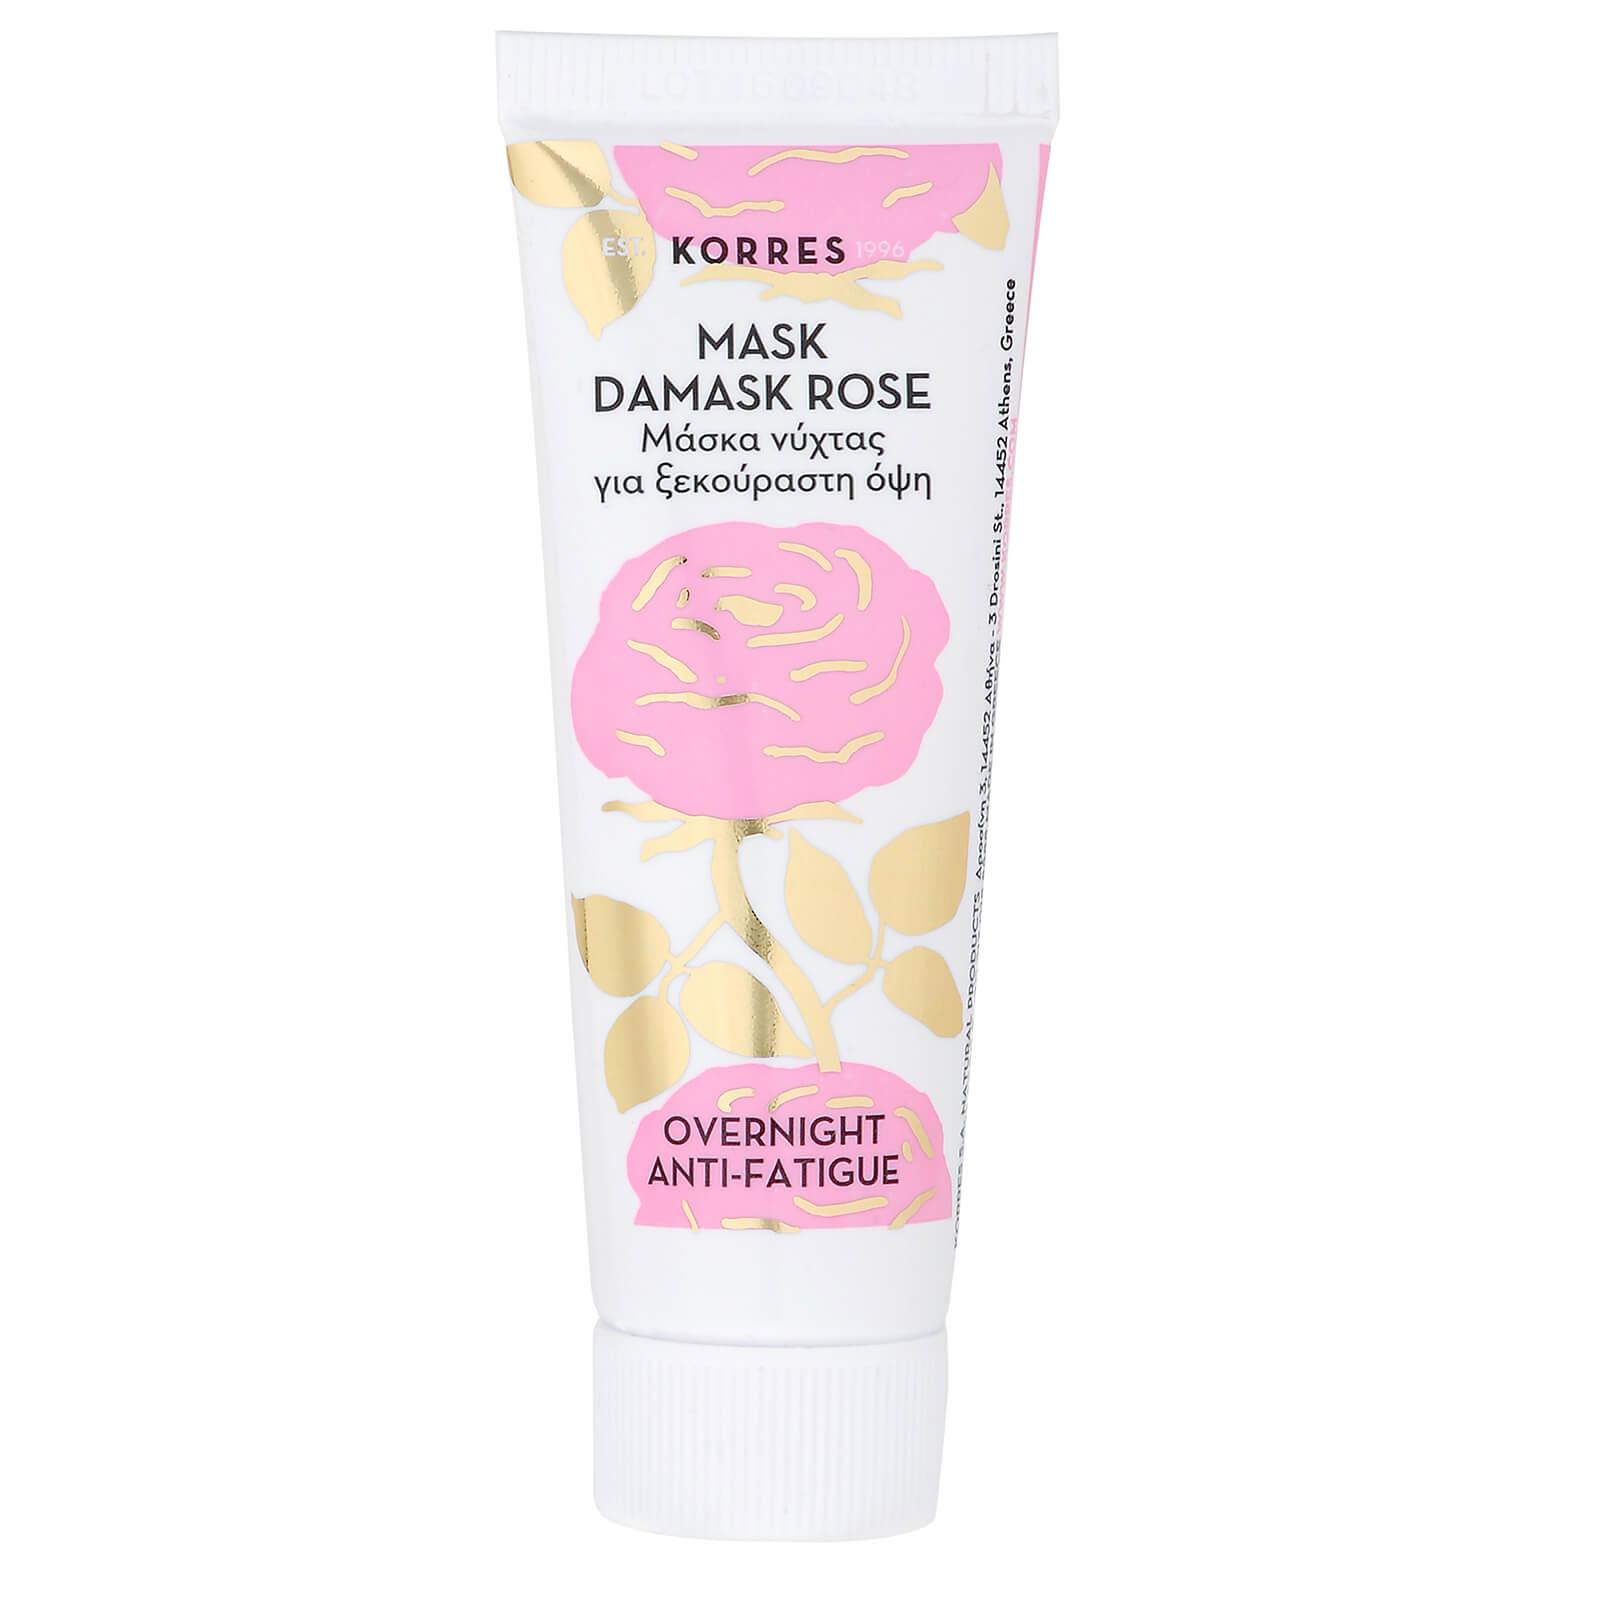 KORRES Natural Damask Rose Overnight Anti-Fatigue Mask 18ml